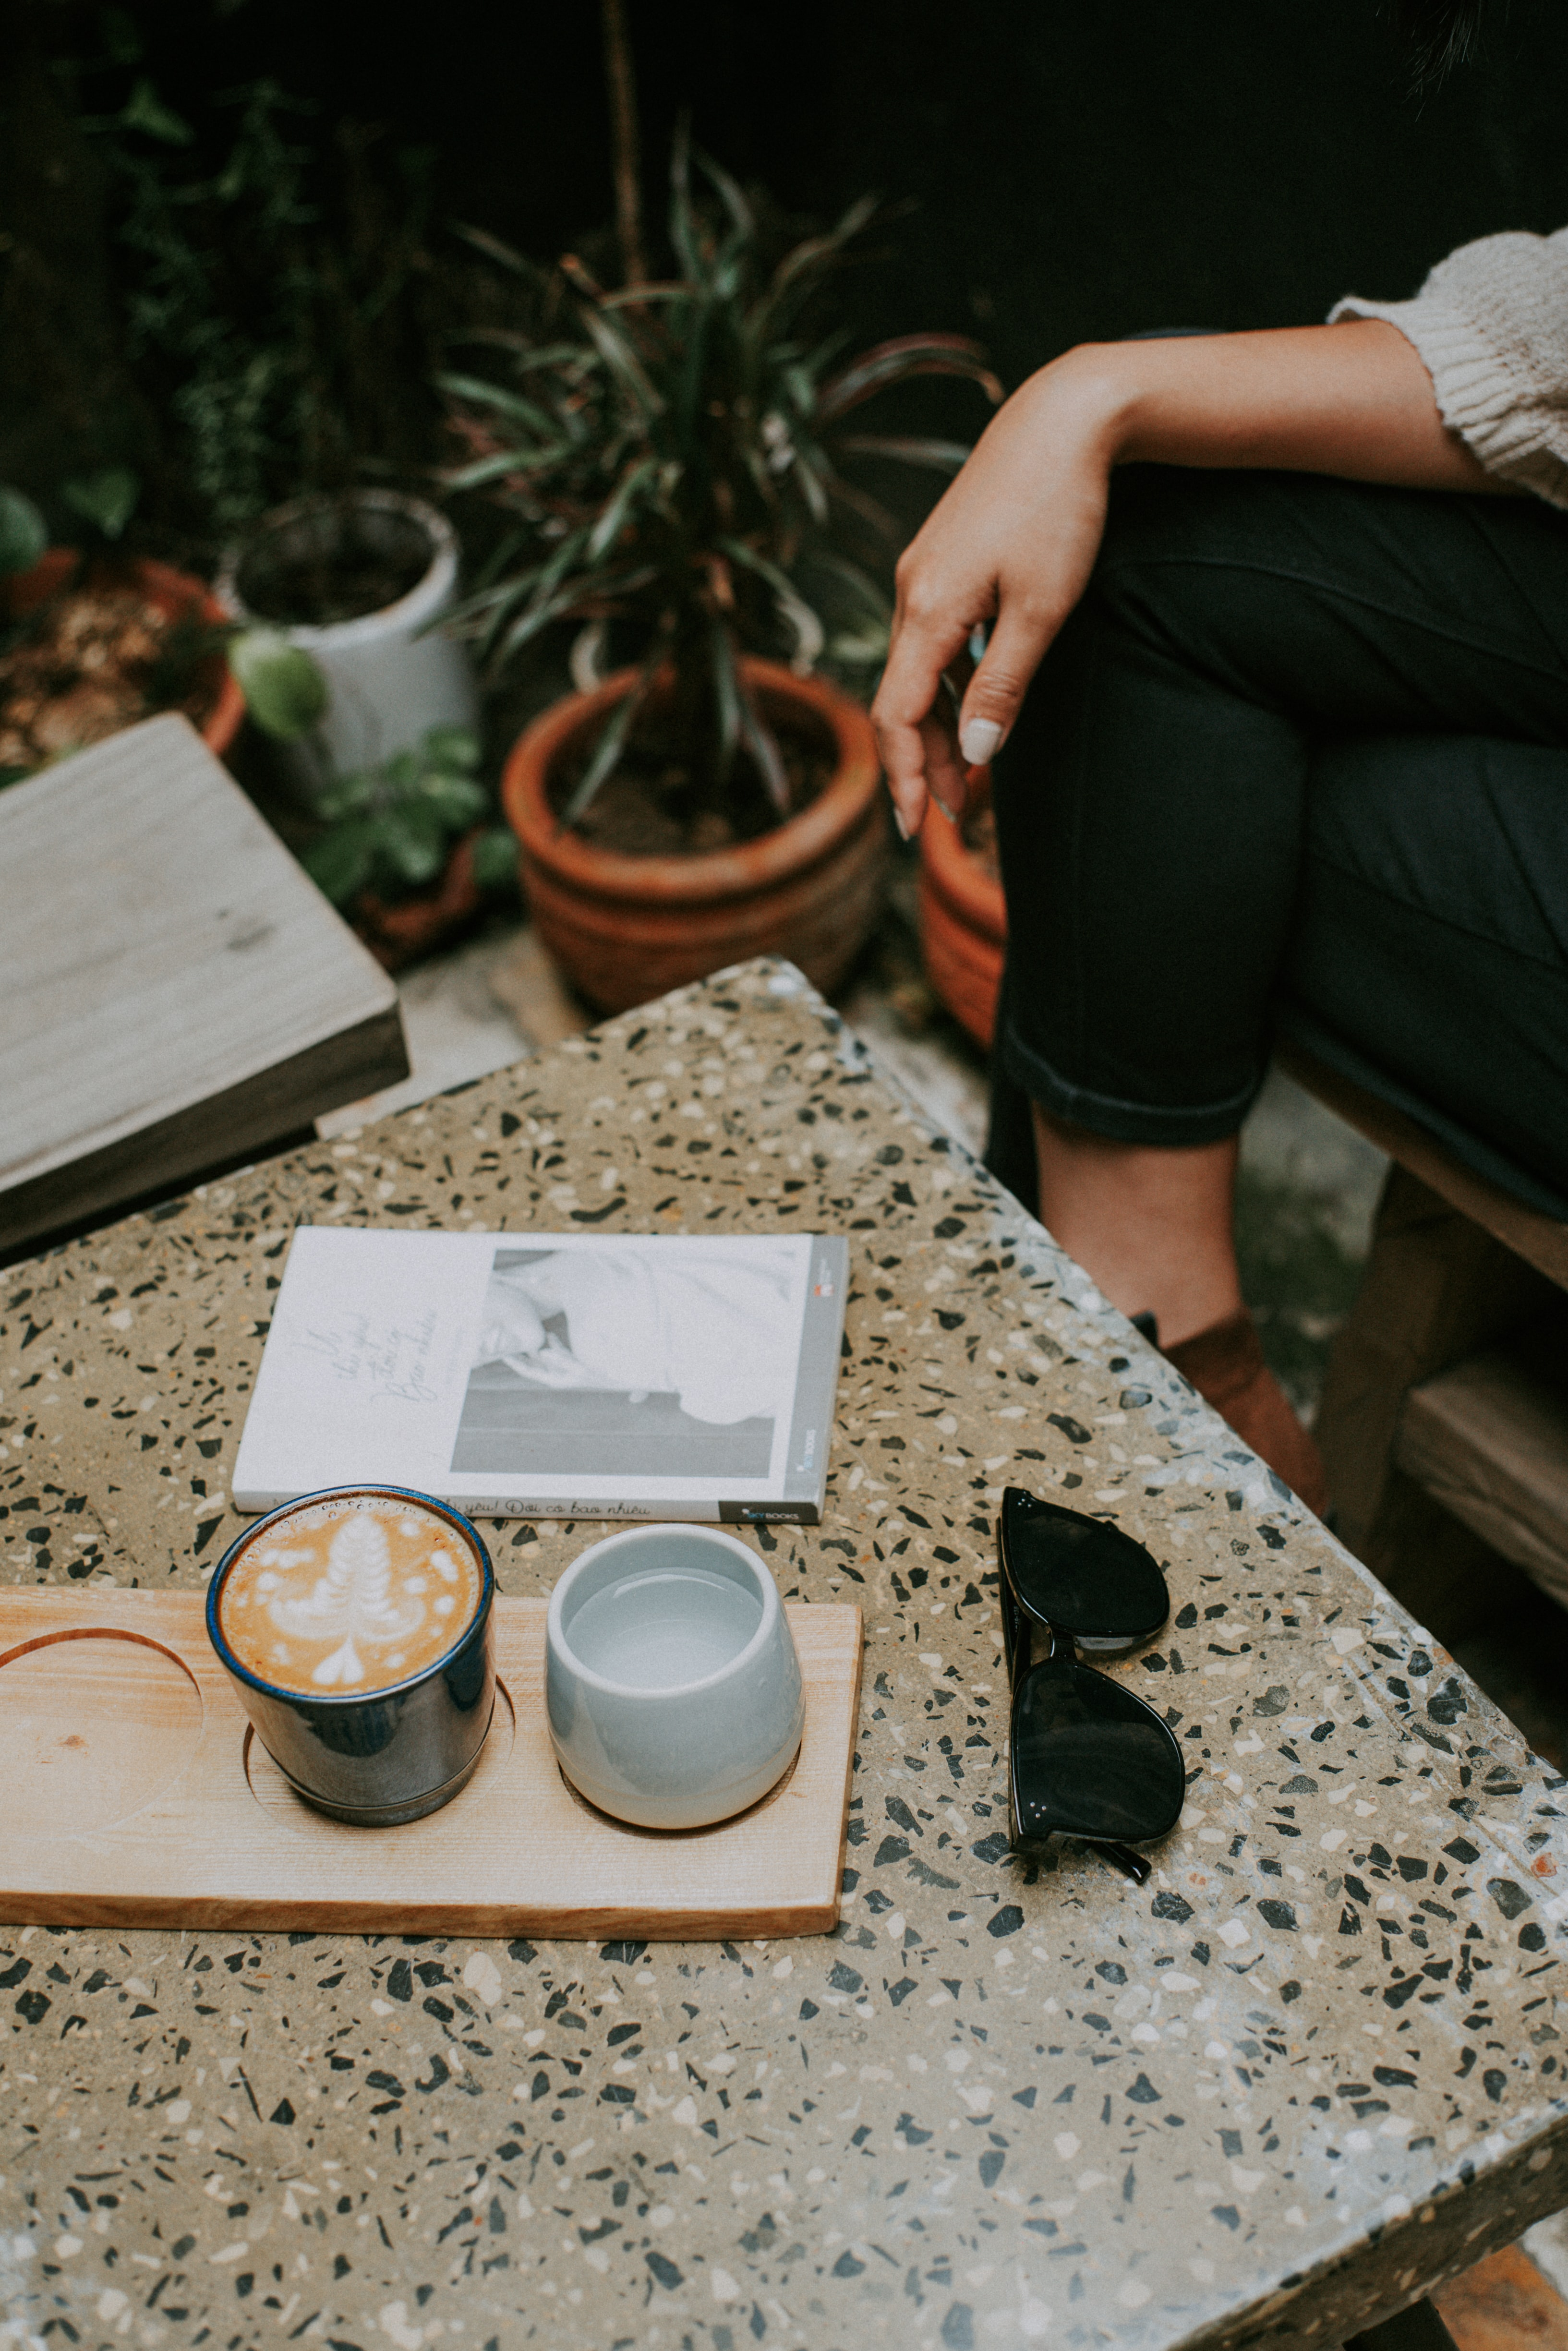 Cup Of Frappe Beside White Ceramic Mug On Brown Slab Photo Free Human Image On Unsplash